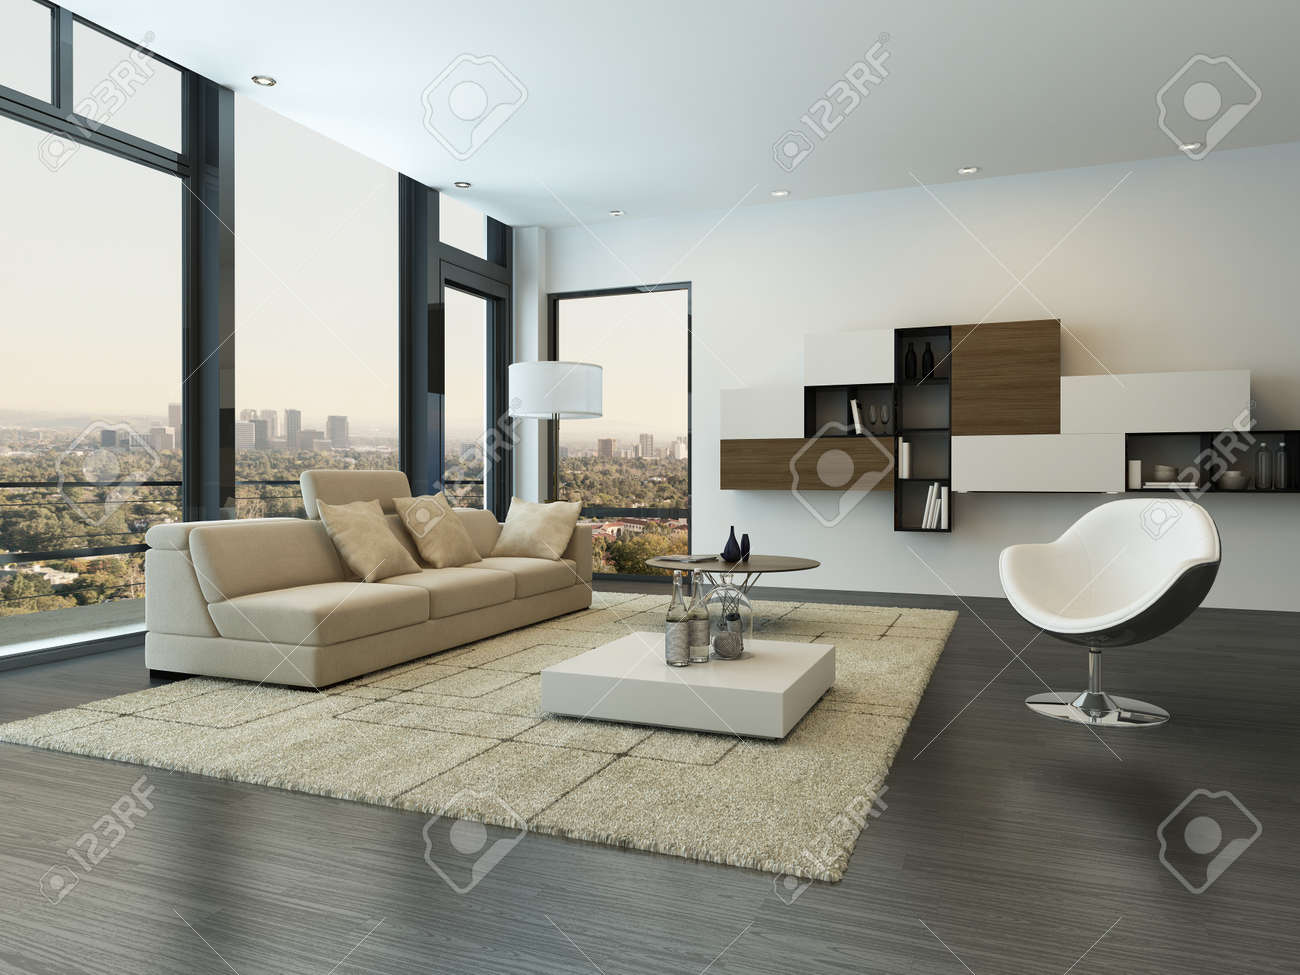 Moderne Woonkamer Interieur Met Design Meubels Royalty-Vrije Foto ...